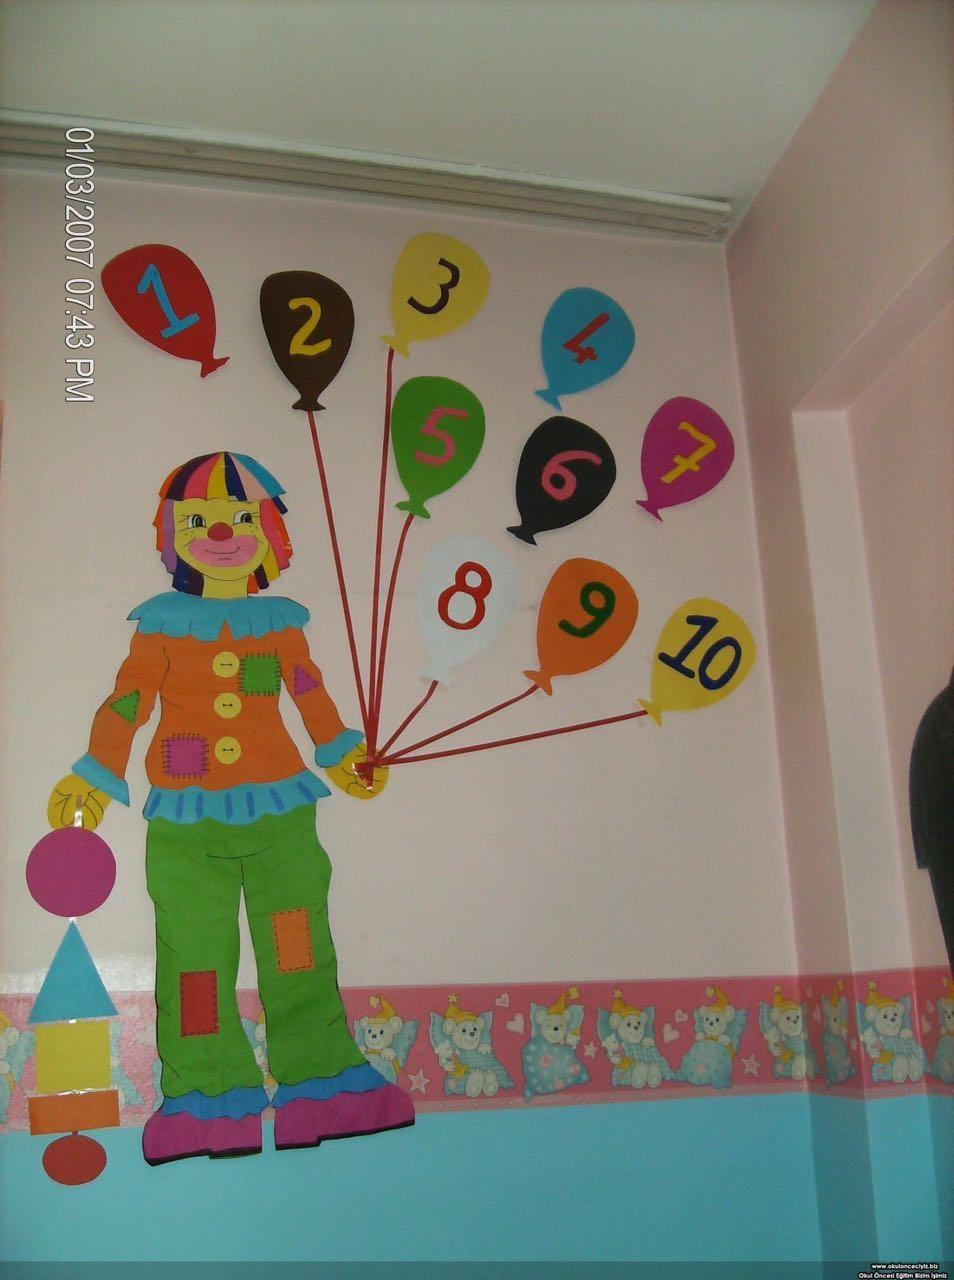 Prescholl Wall Decorations « Funnycrafts Inside Preschool Wall Decoration (View 8 of 20)